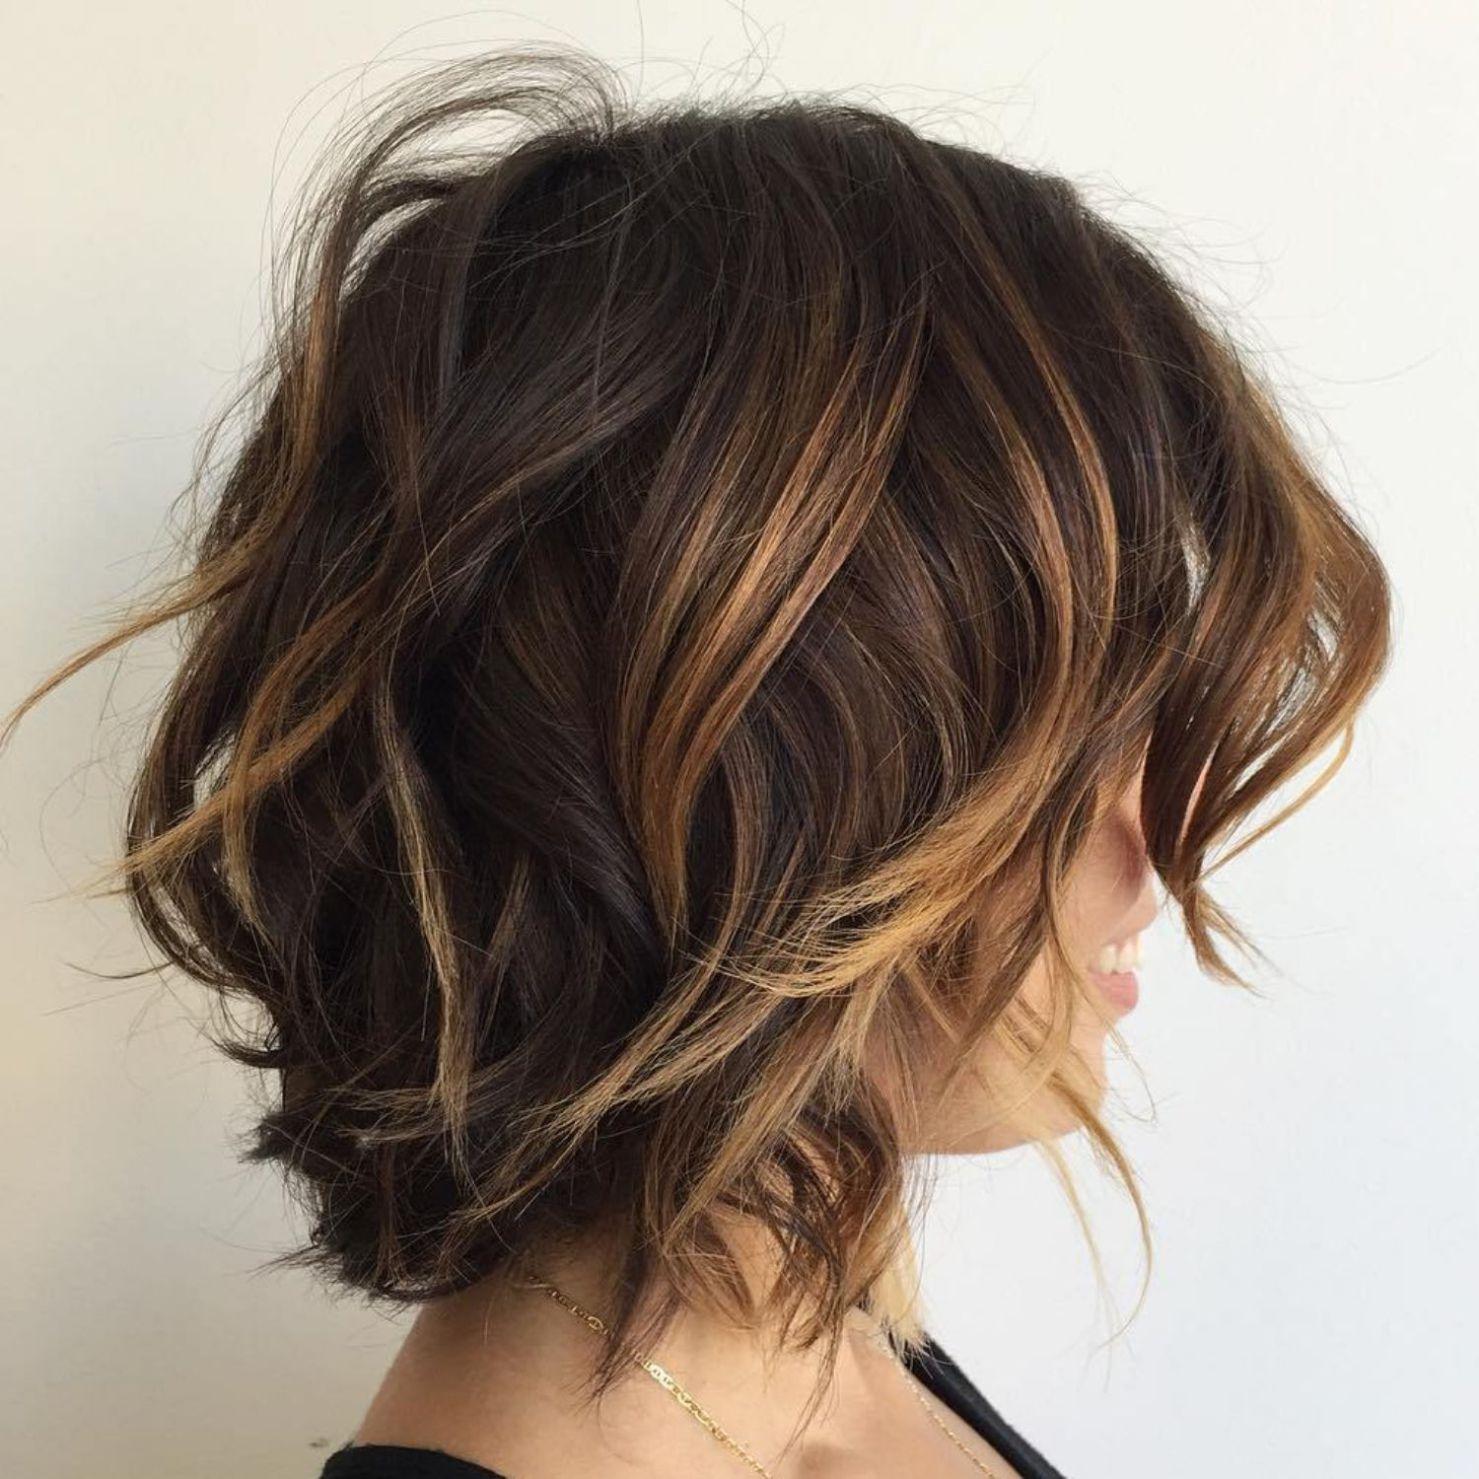 Brown Choppy Bob With Caramel Highlights Brunette Hair Color Short Brunette Hair Hair Styles